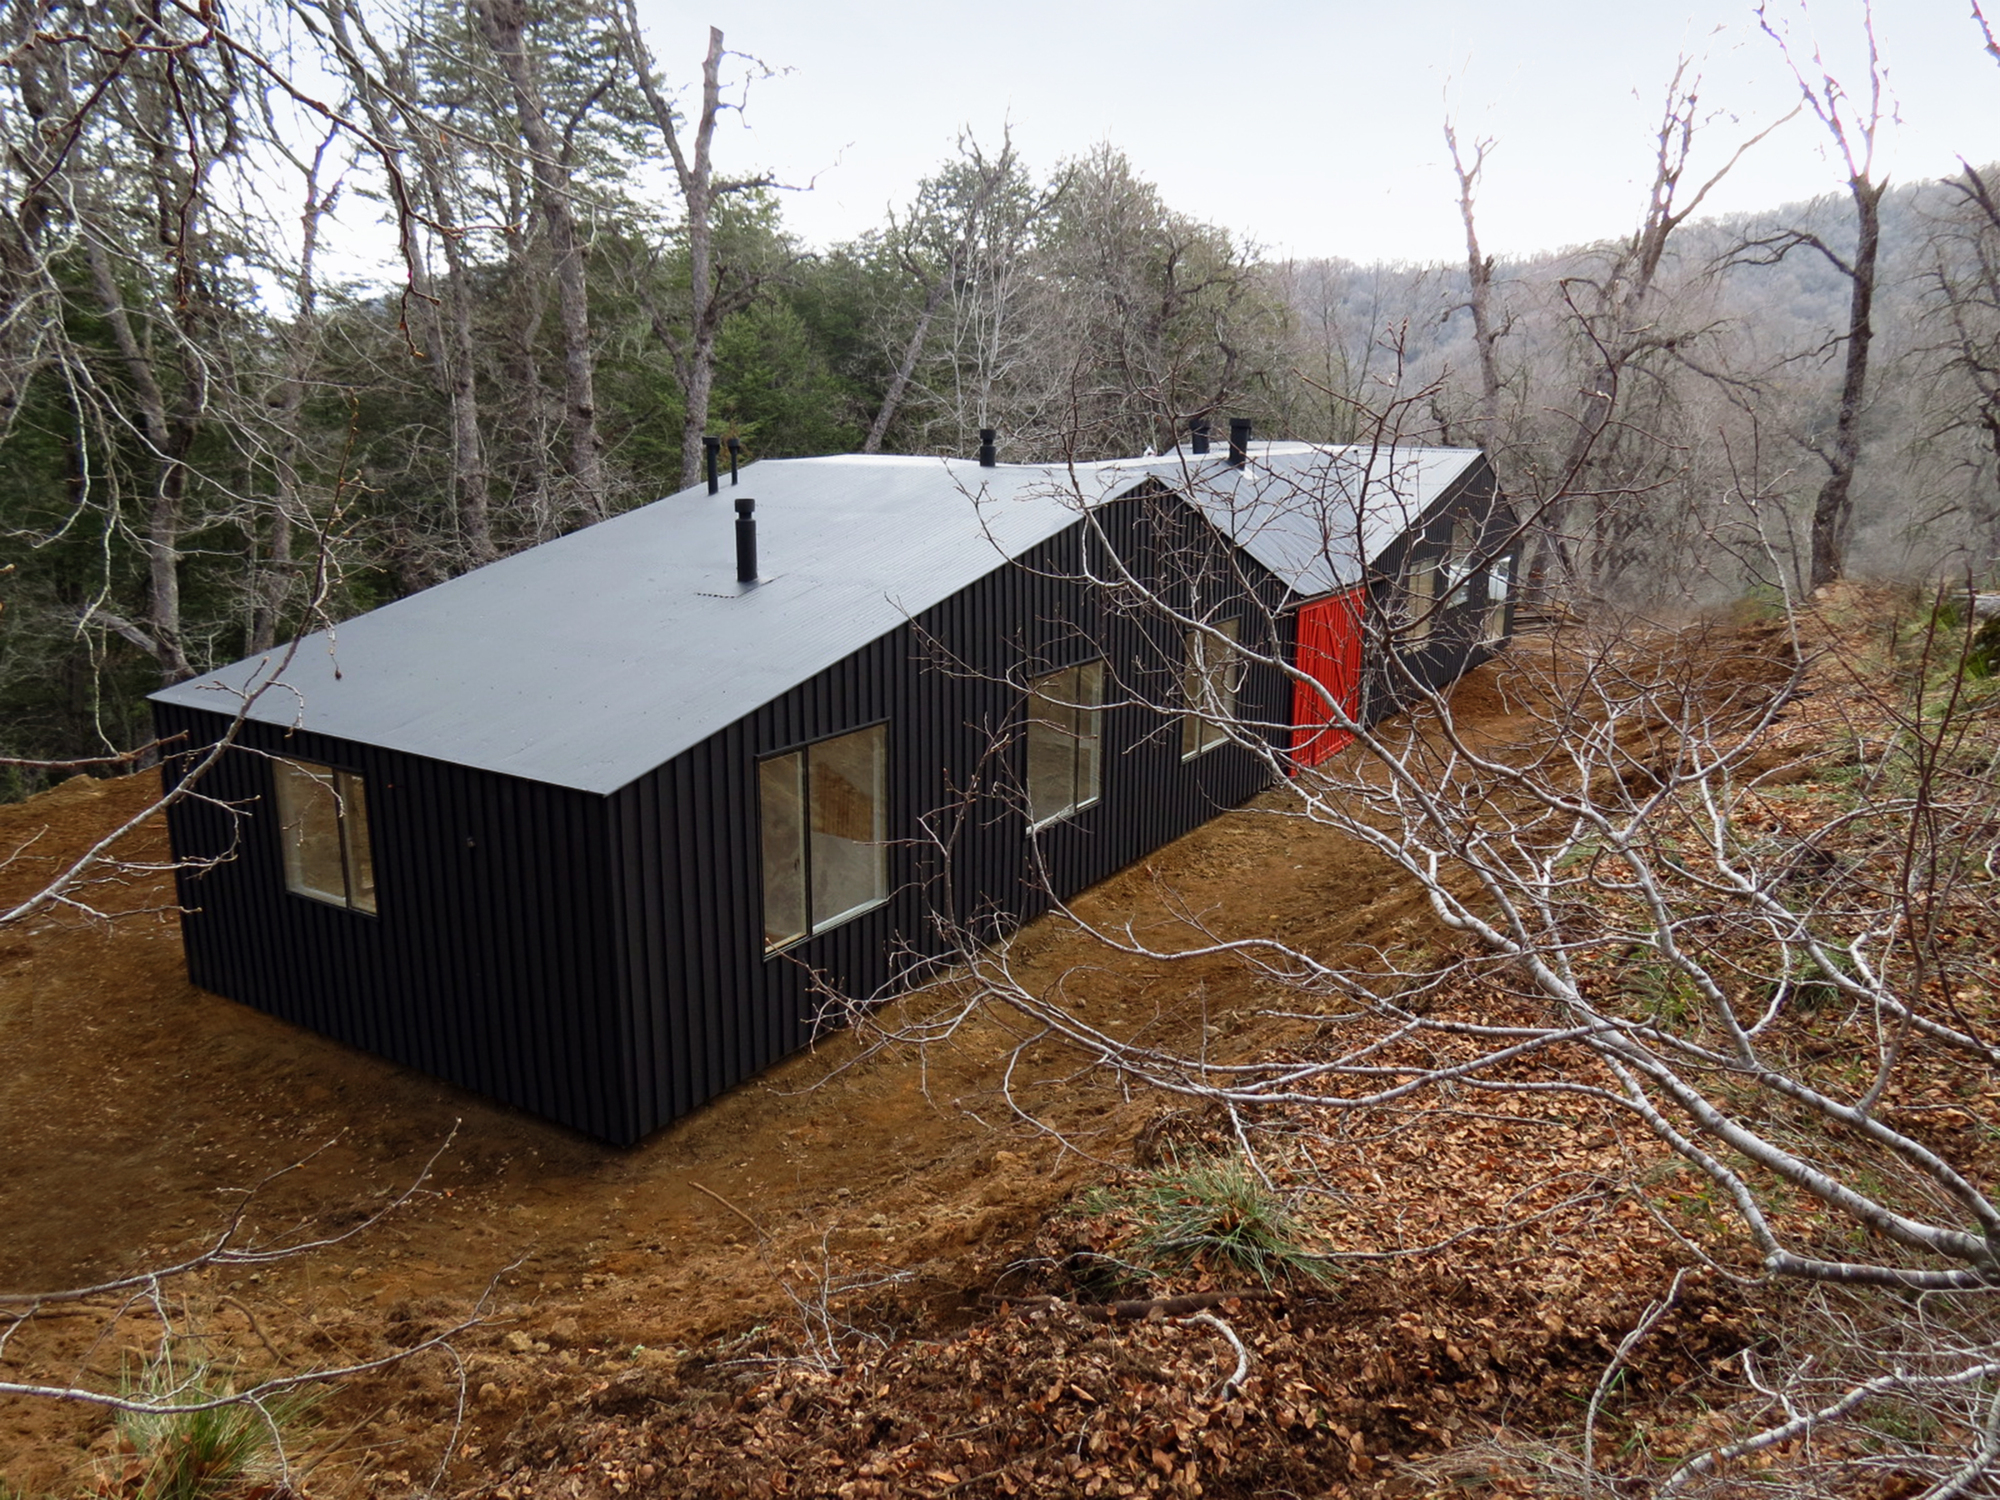 MR House / MAPA, Courtesy of MAPA